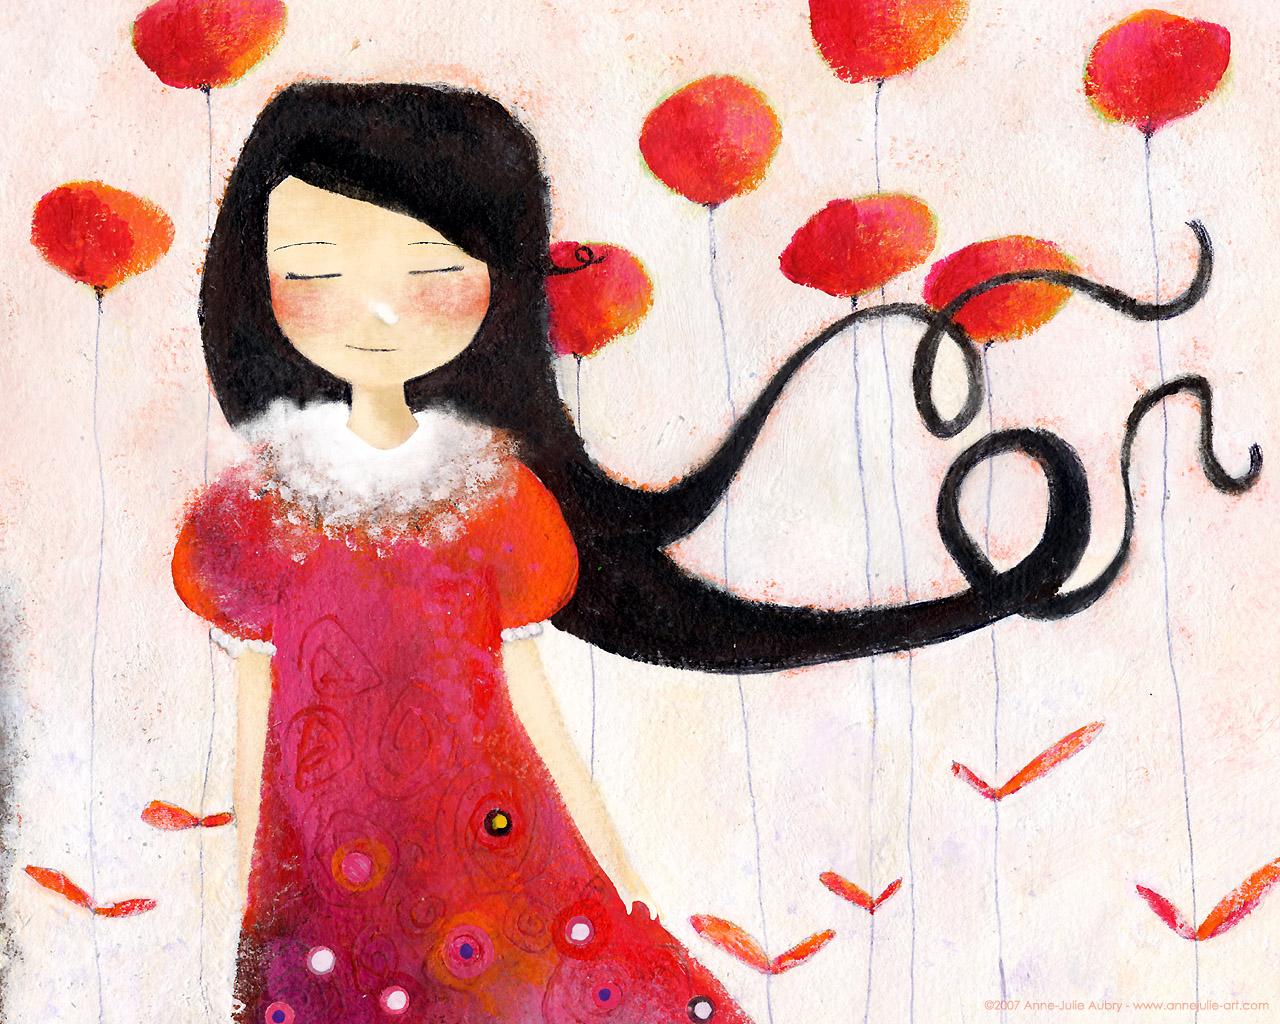 http://annejulie-art.com/bonus/coquelicots_1024x1280byannejulie.jpg